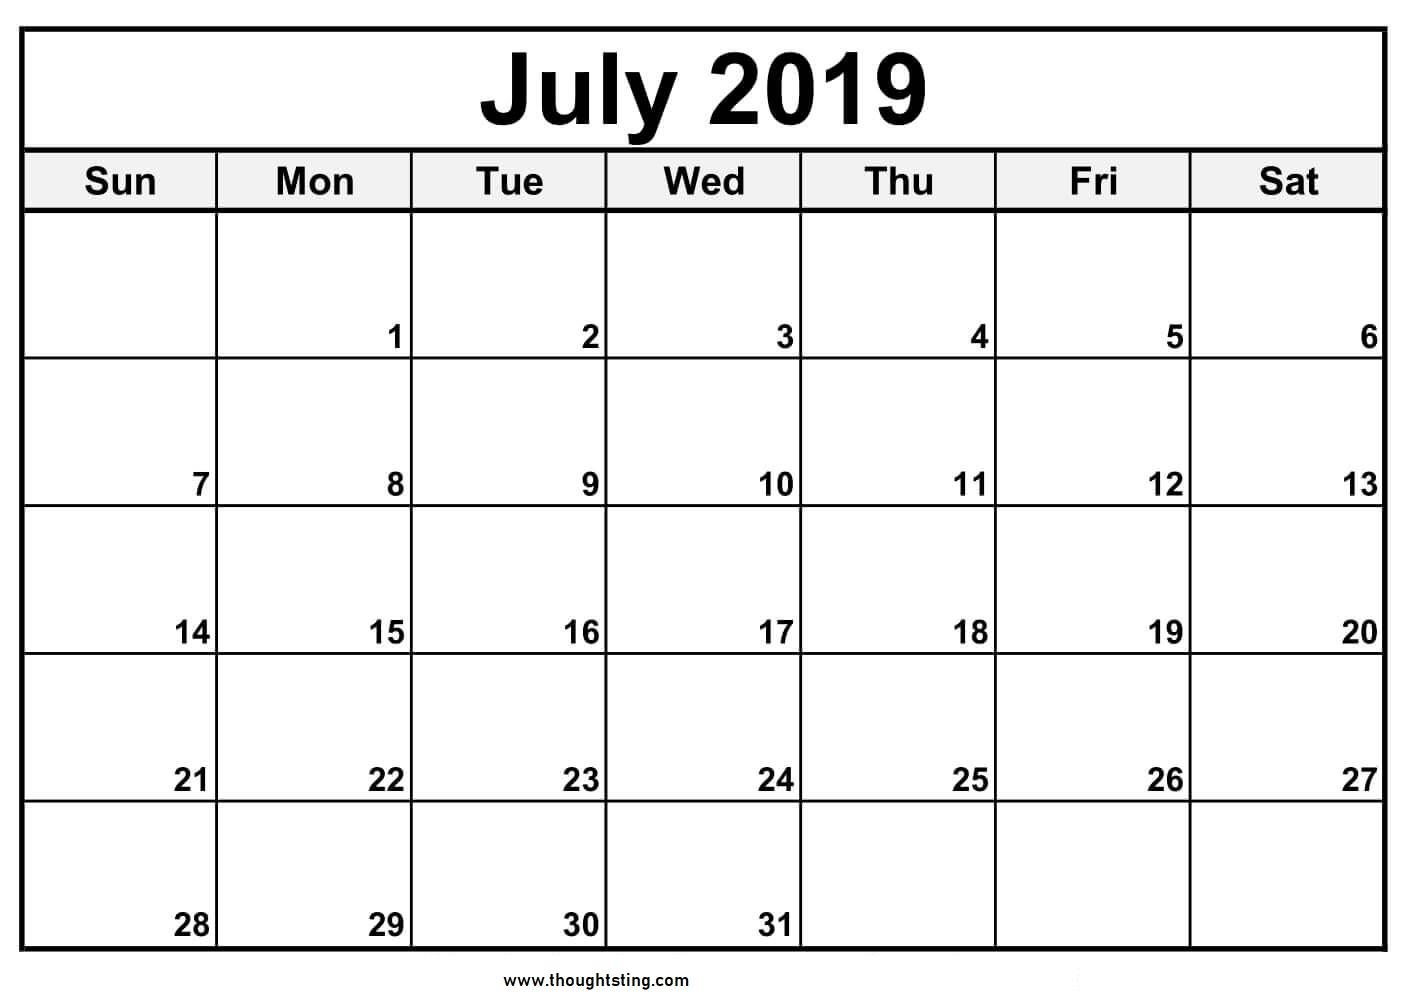 July Calendar 2019 Printable Template - Free Printable Calendar throughout July Calendar Printable Template